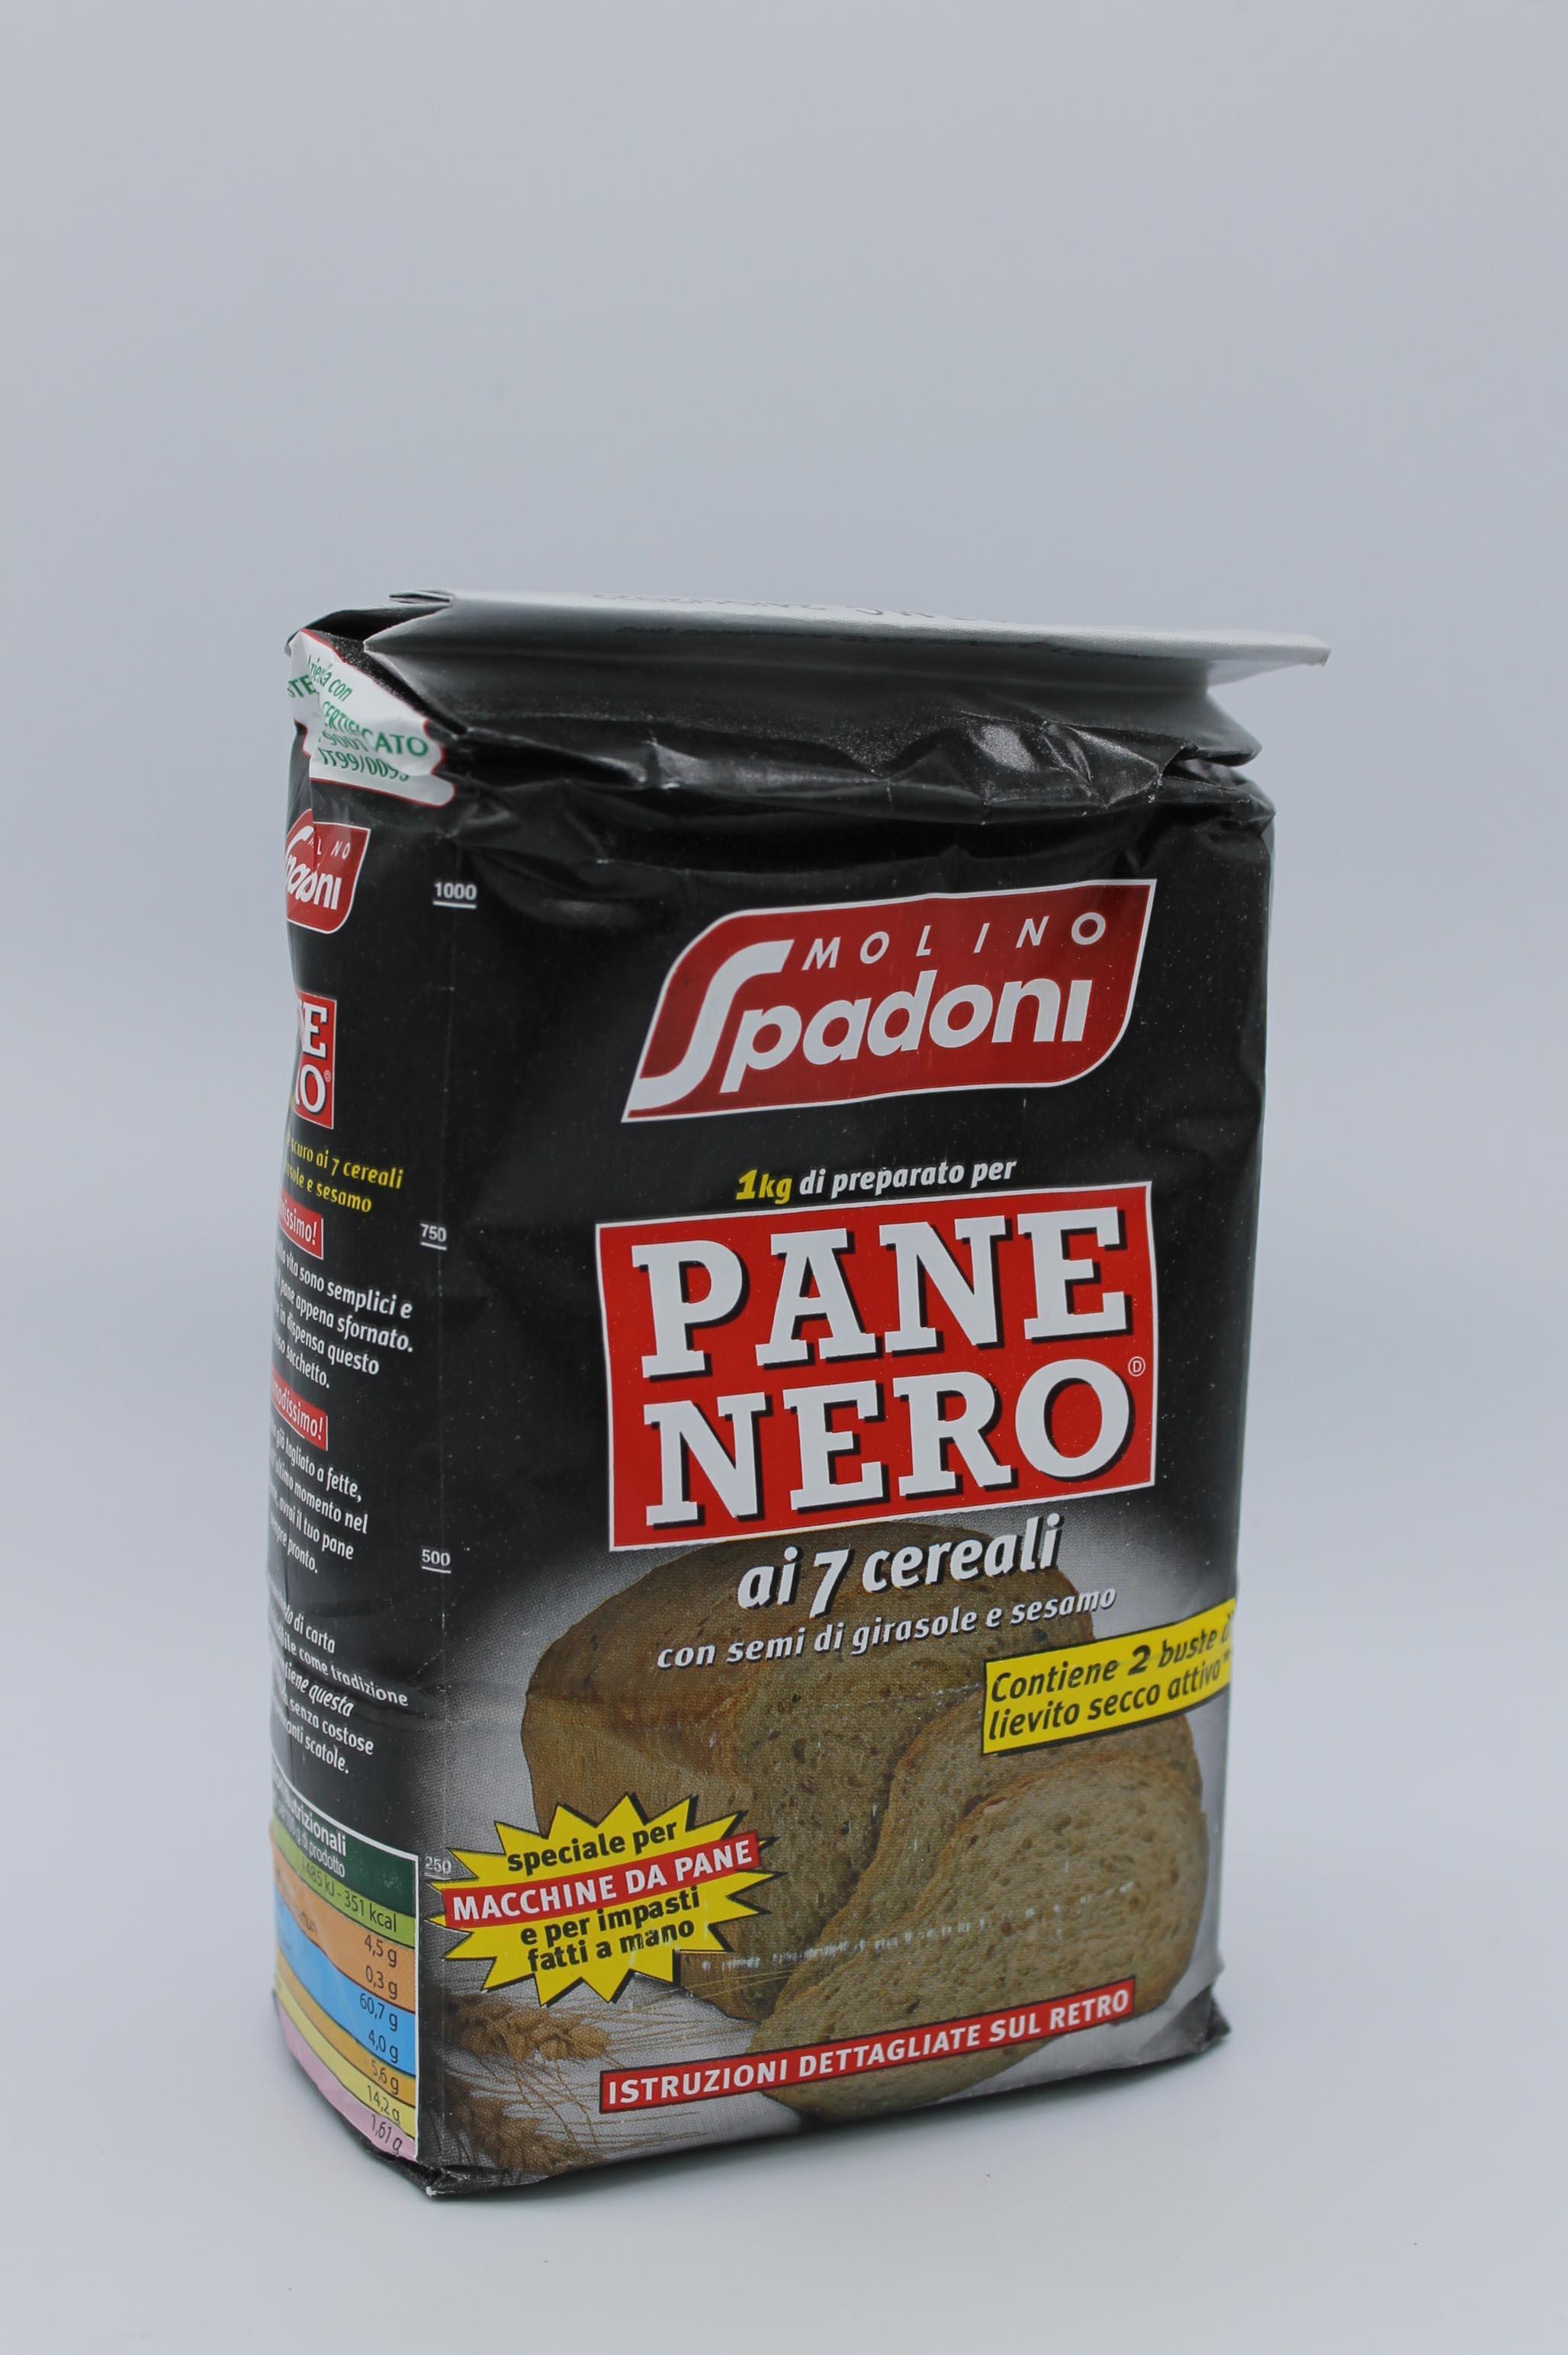 Spadoni farina per pane nero 1kg.